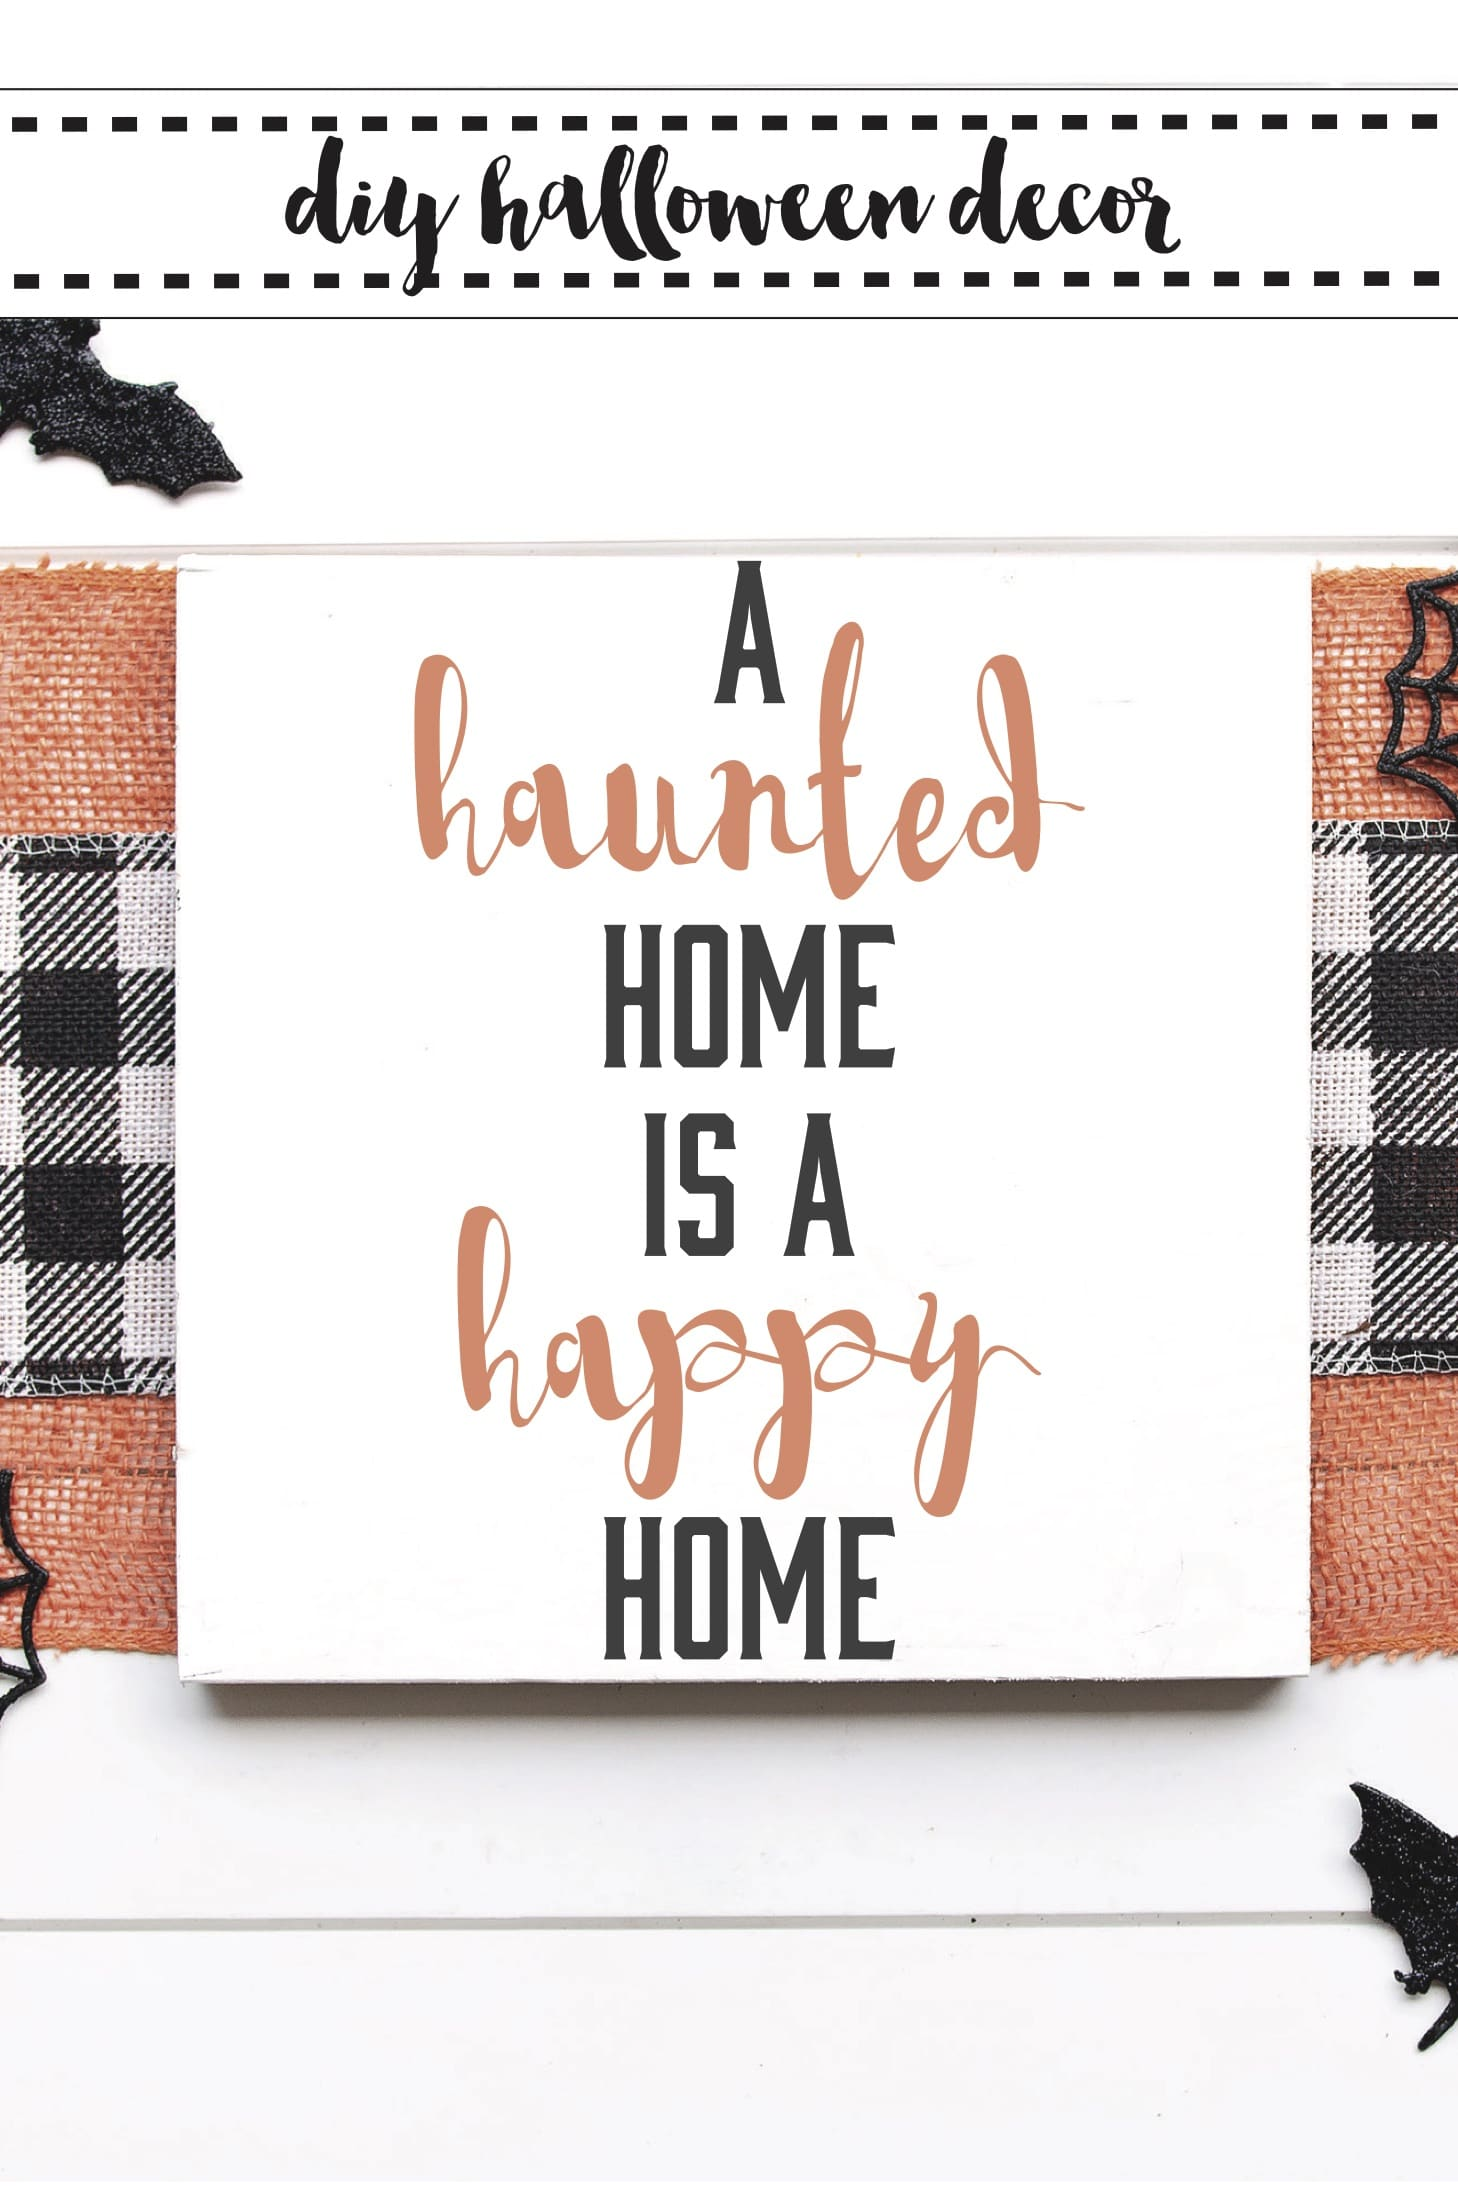 Halloween SVG / Cricut Halloween Sign / Cricut Halloween Decor / Halloween Ideas / Free SVG Files via @clarkscondensed